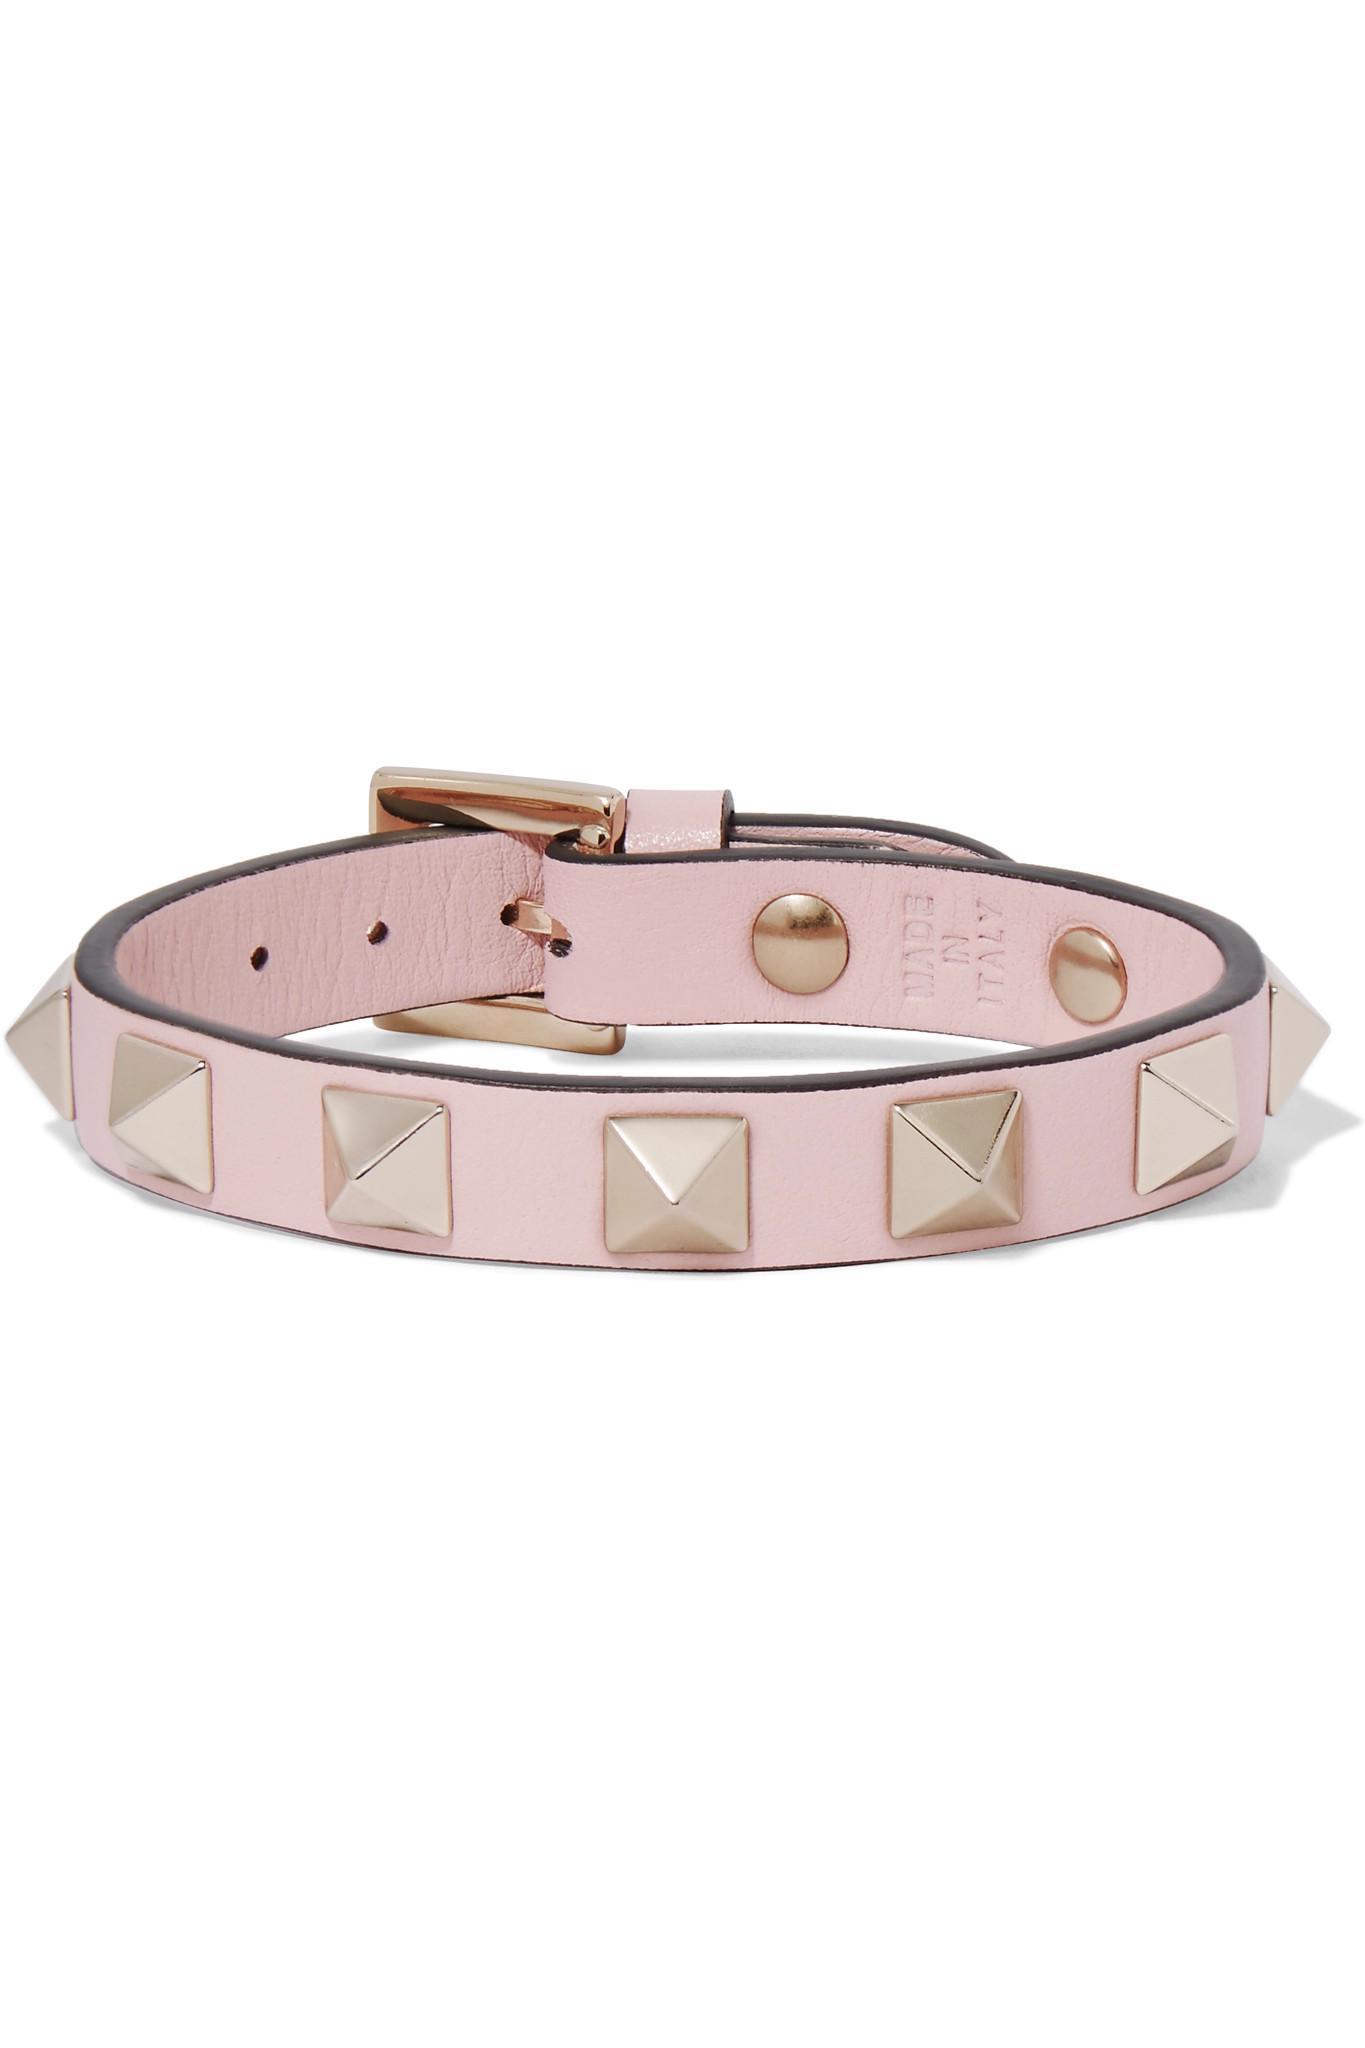 Valentino Garavani The Rockstud Leather And Gold-tone Bracelet - Pink Valentino NeWILl